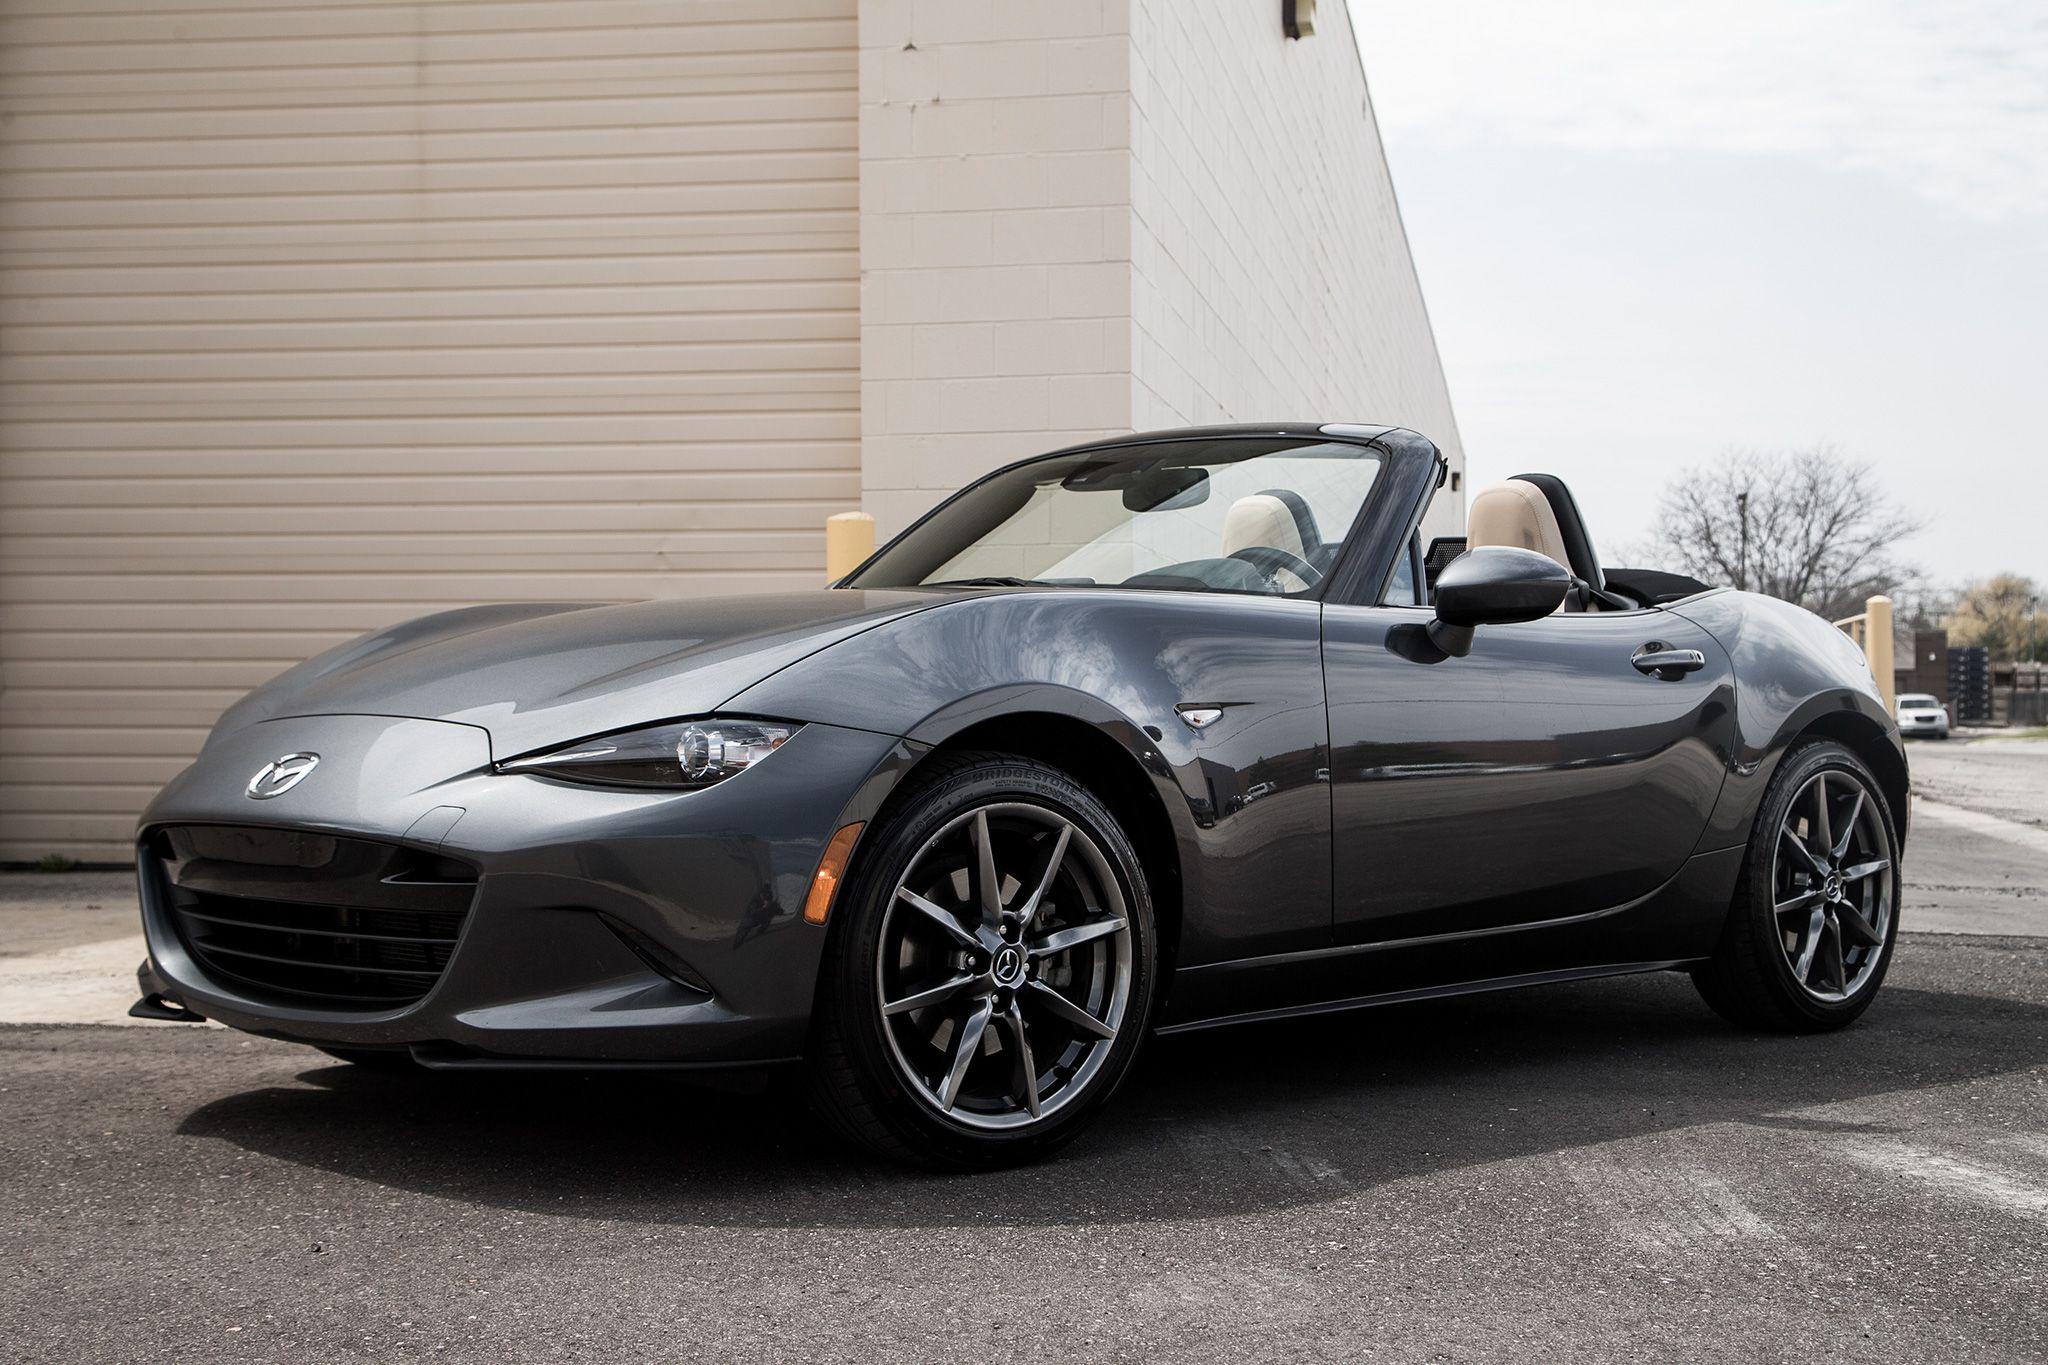 http://st.automobilemag.com/uploads/sites/11/2016/07/2016-Mazda-MX-5 ...